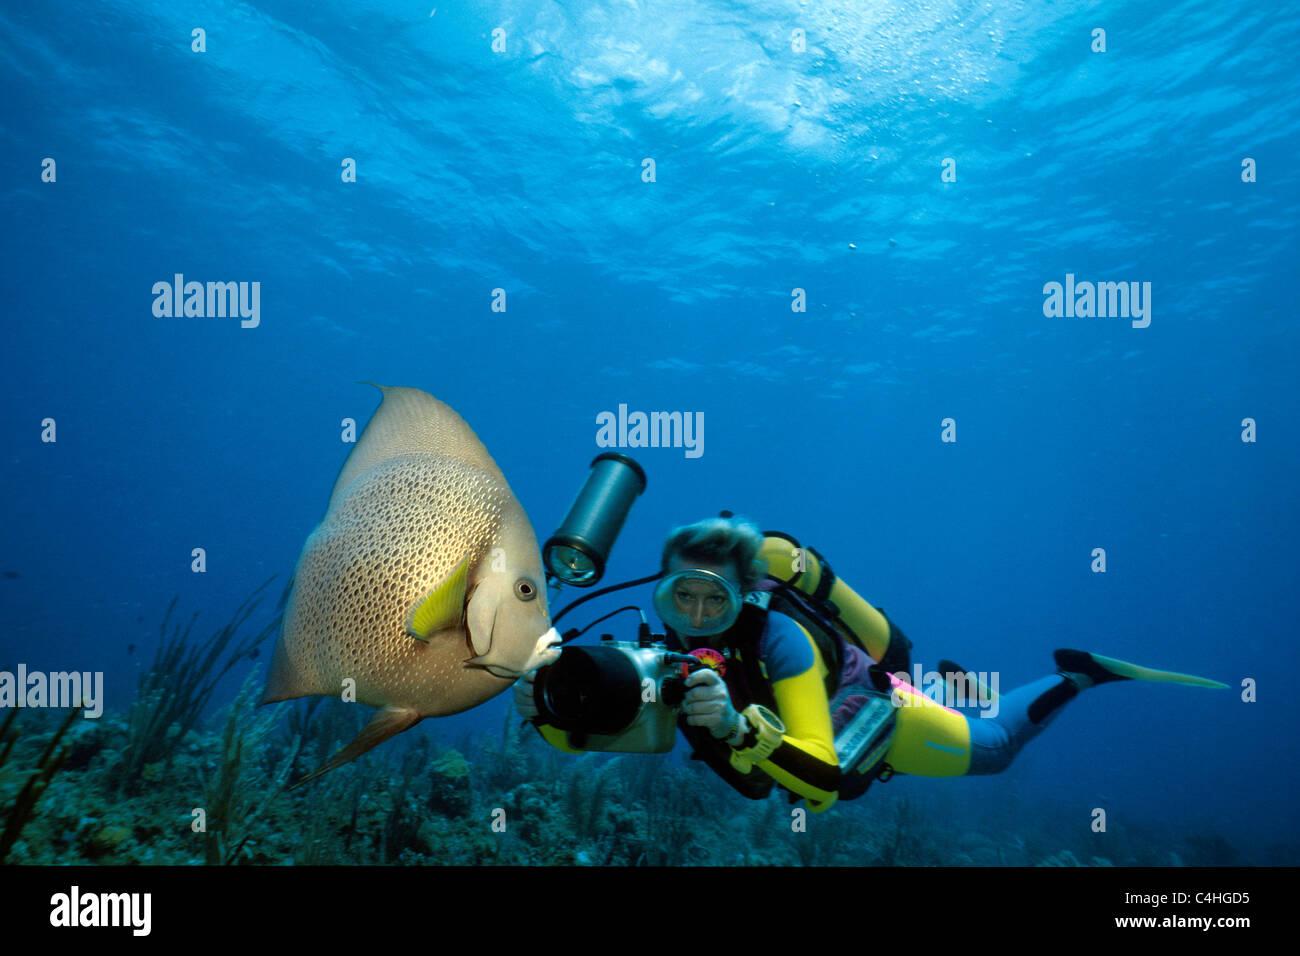 Scuba diver photographing a Caribbean angelfish (Pomacanthus arcuatus), Stock Photo